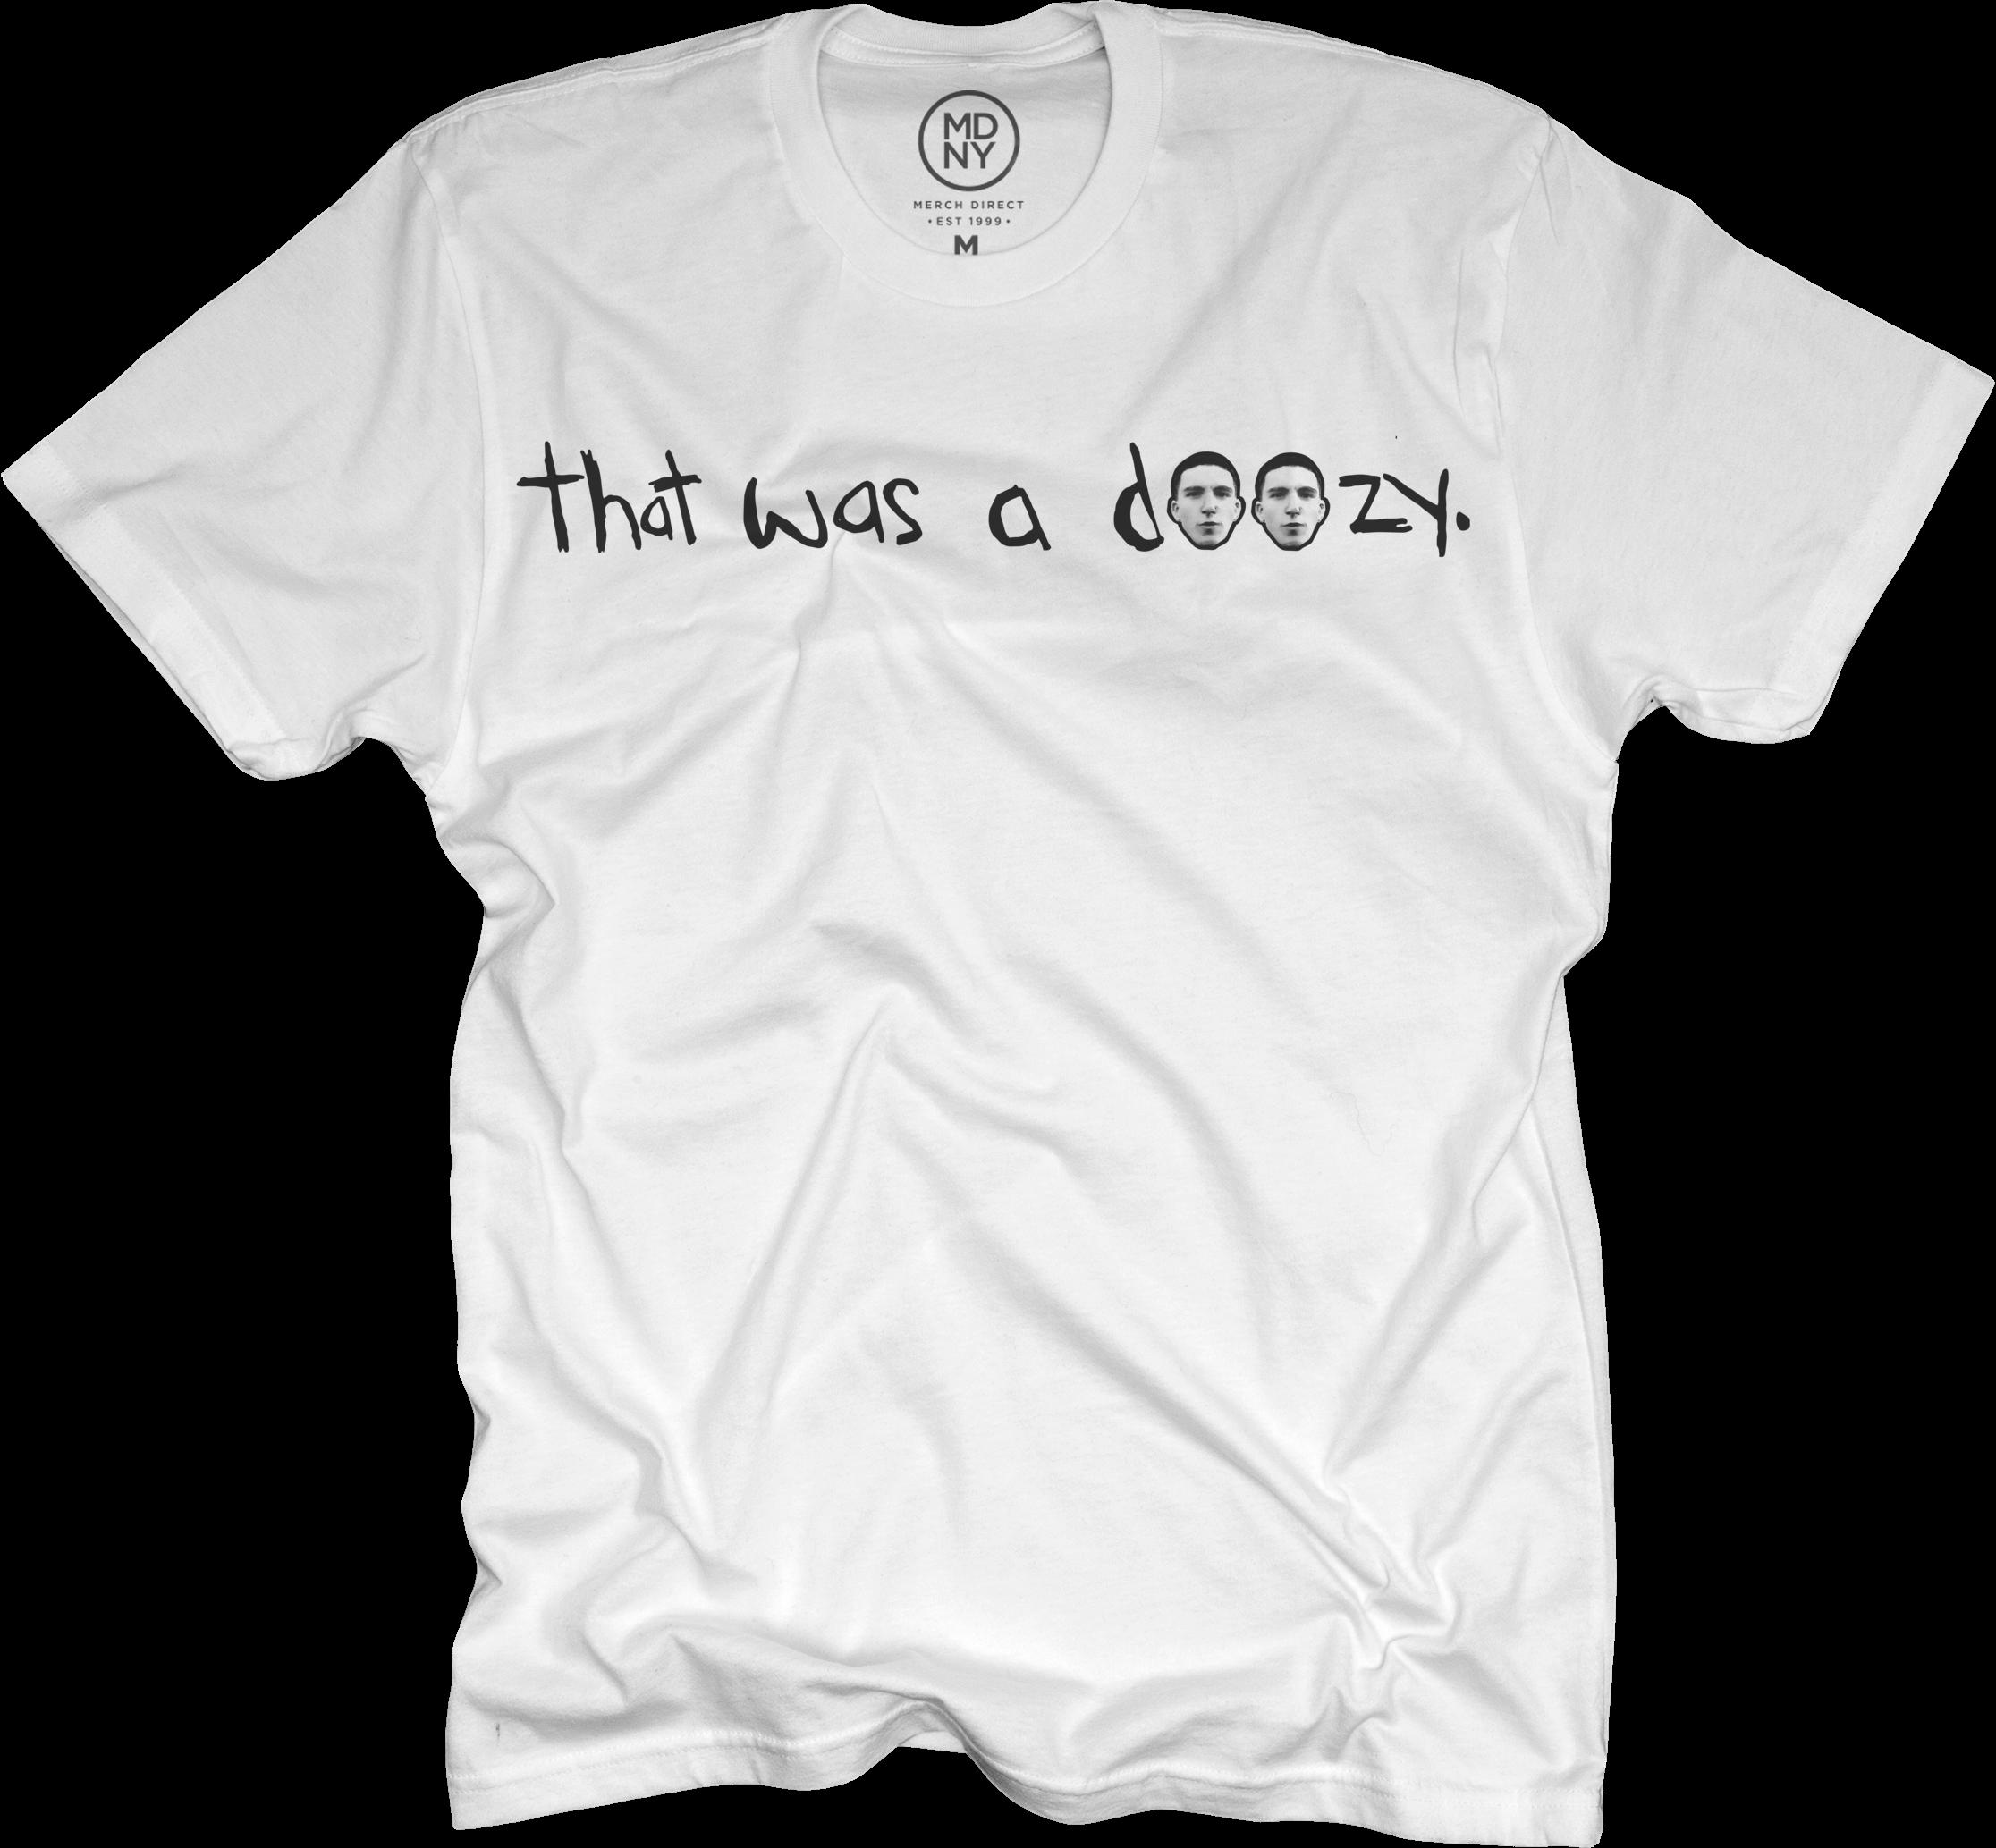 Doozy White T-Shirt